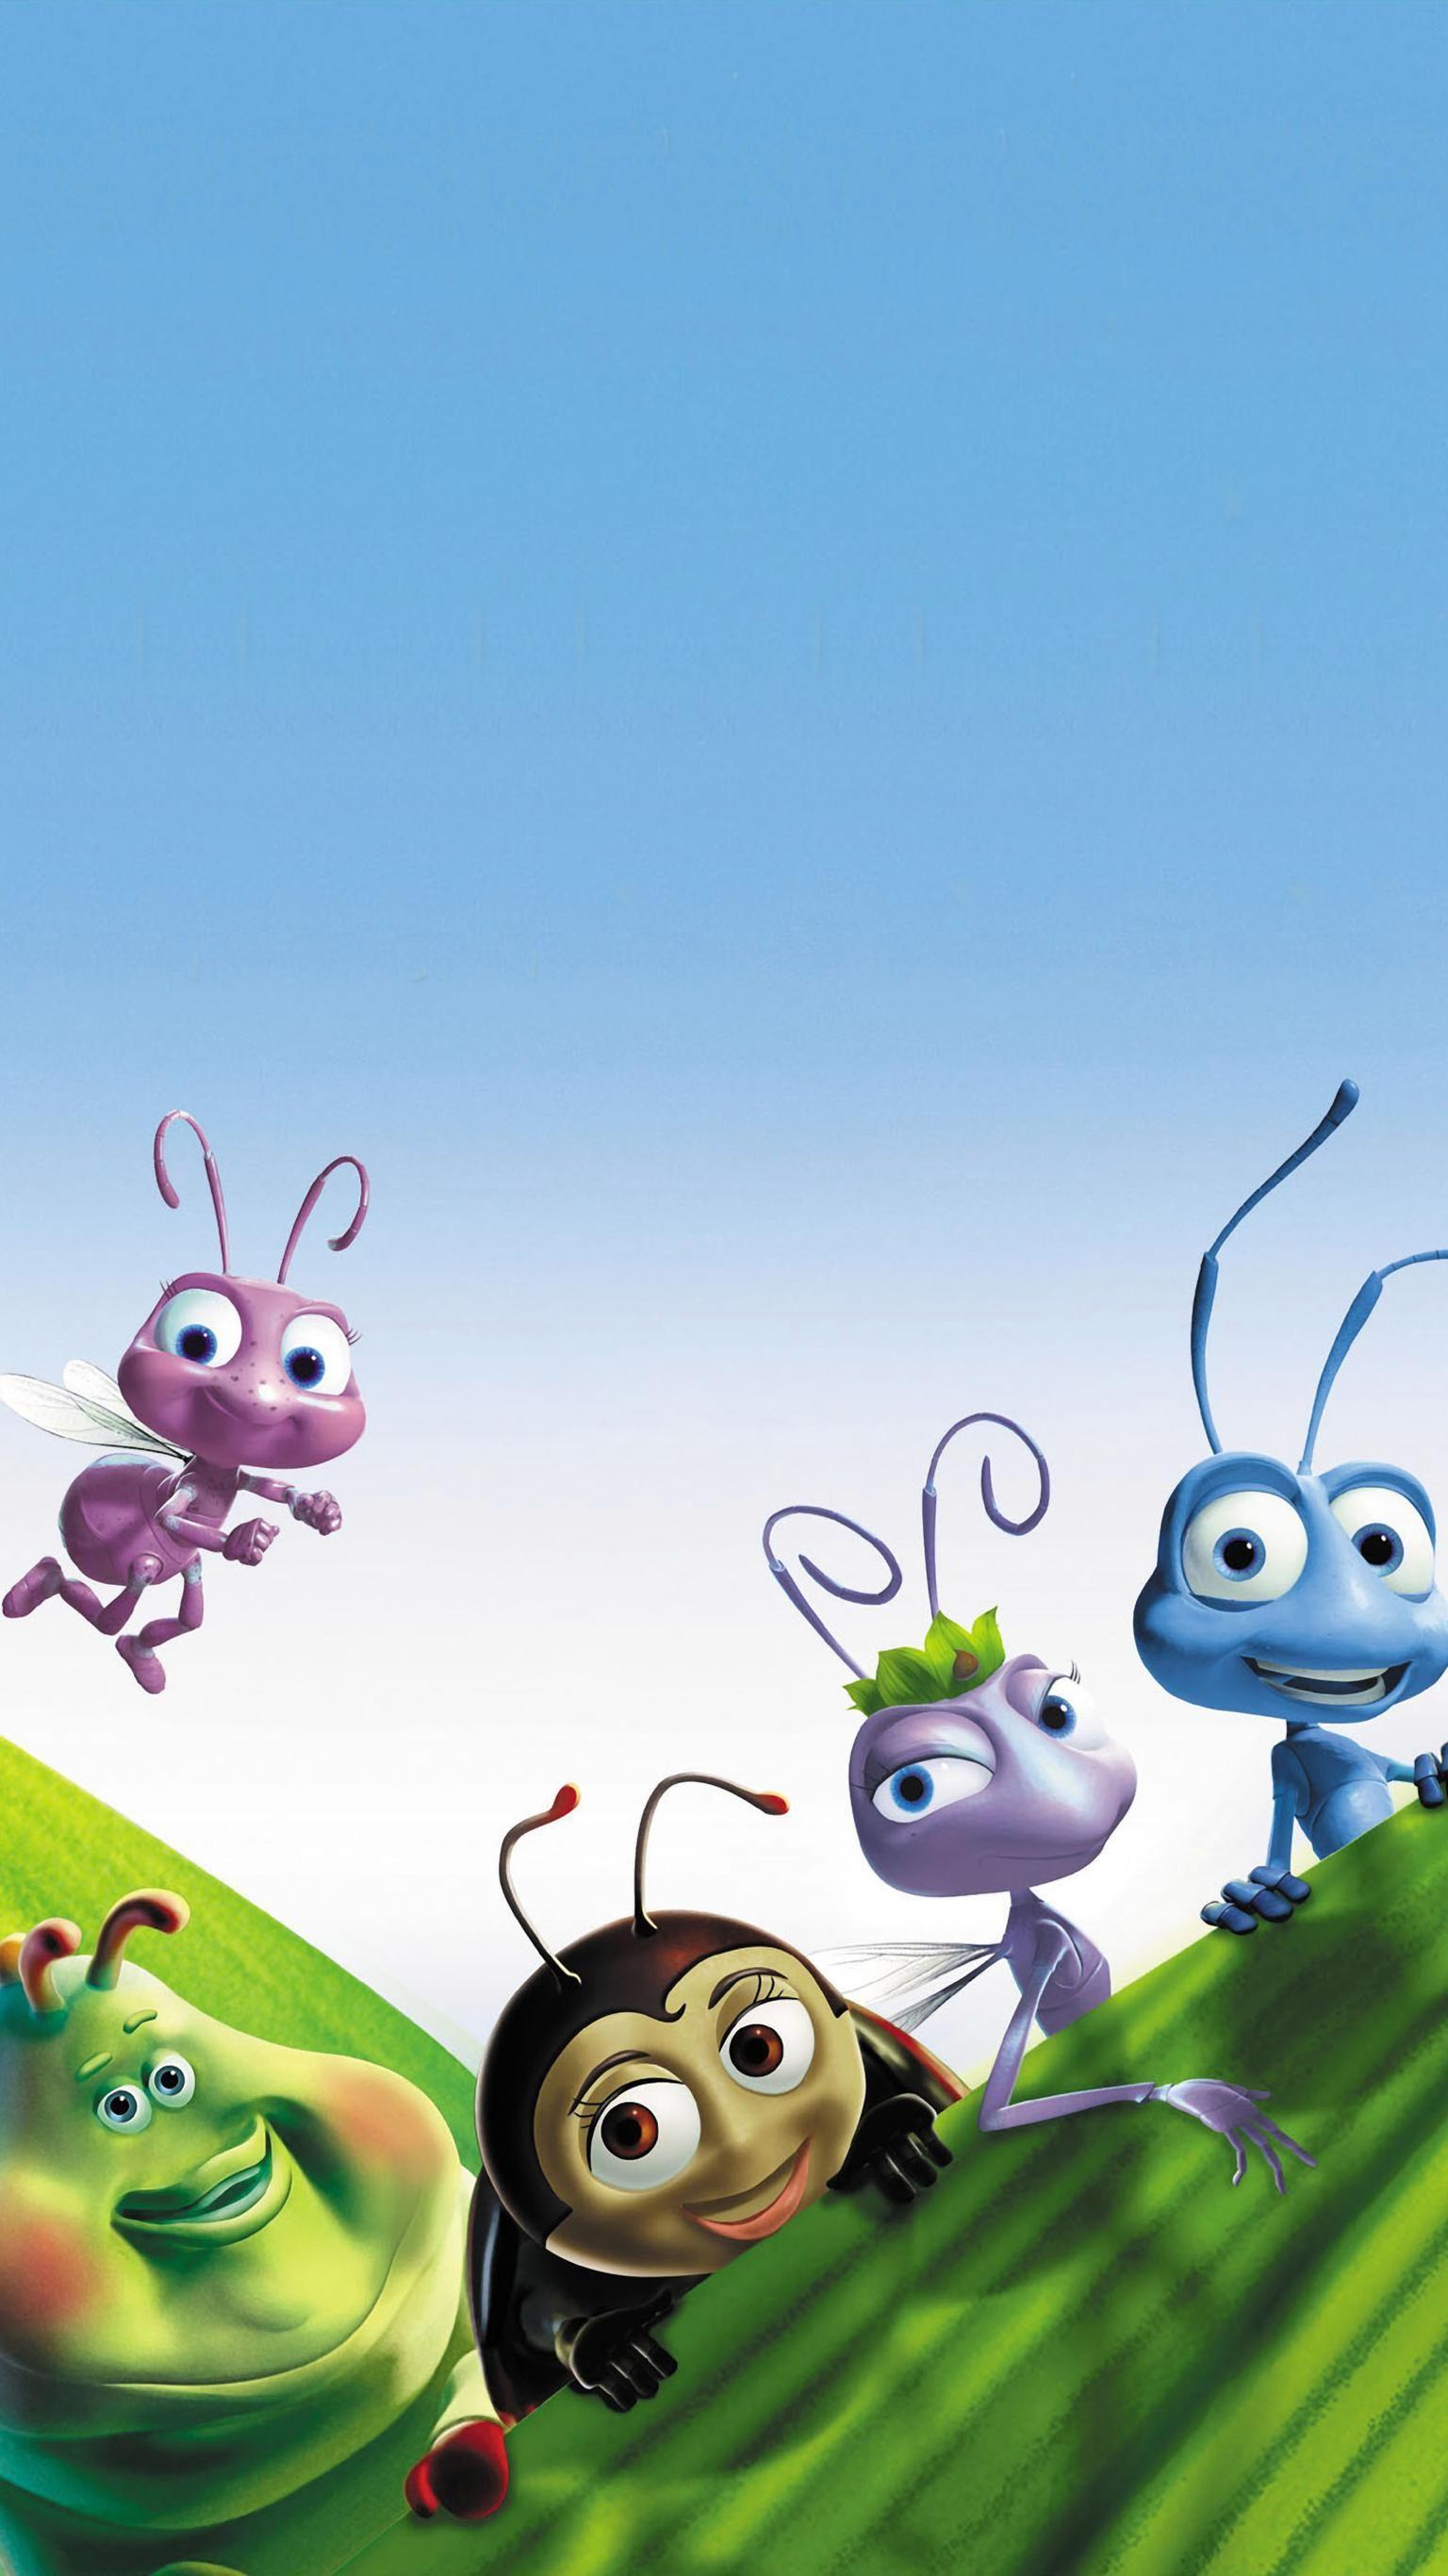 A Bug S Life 1998 Phone Wallpaper Cartoon Wallpaper Disney Images, Photos, Reviews